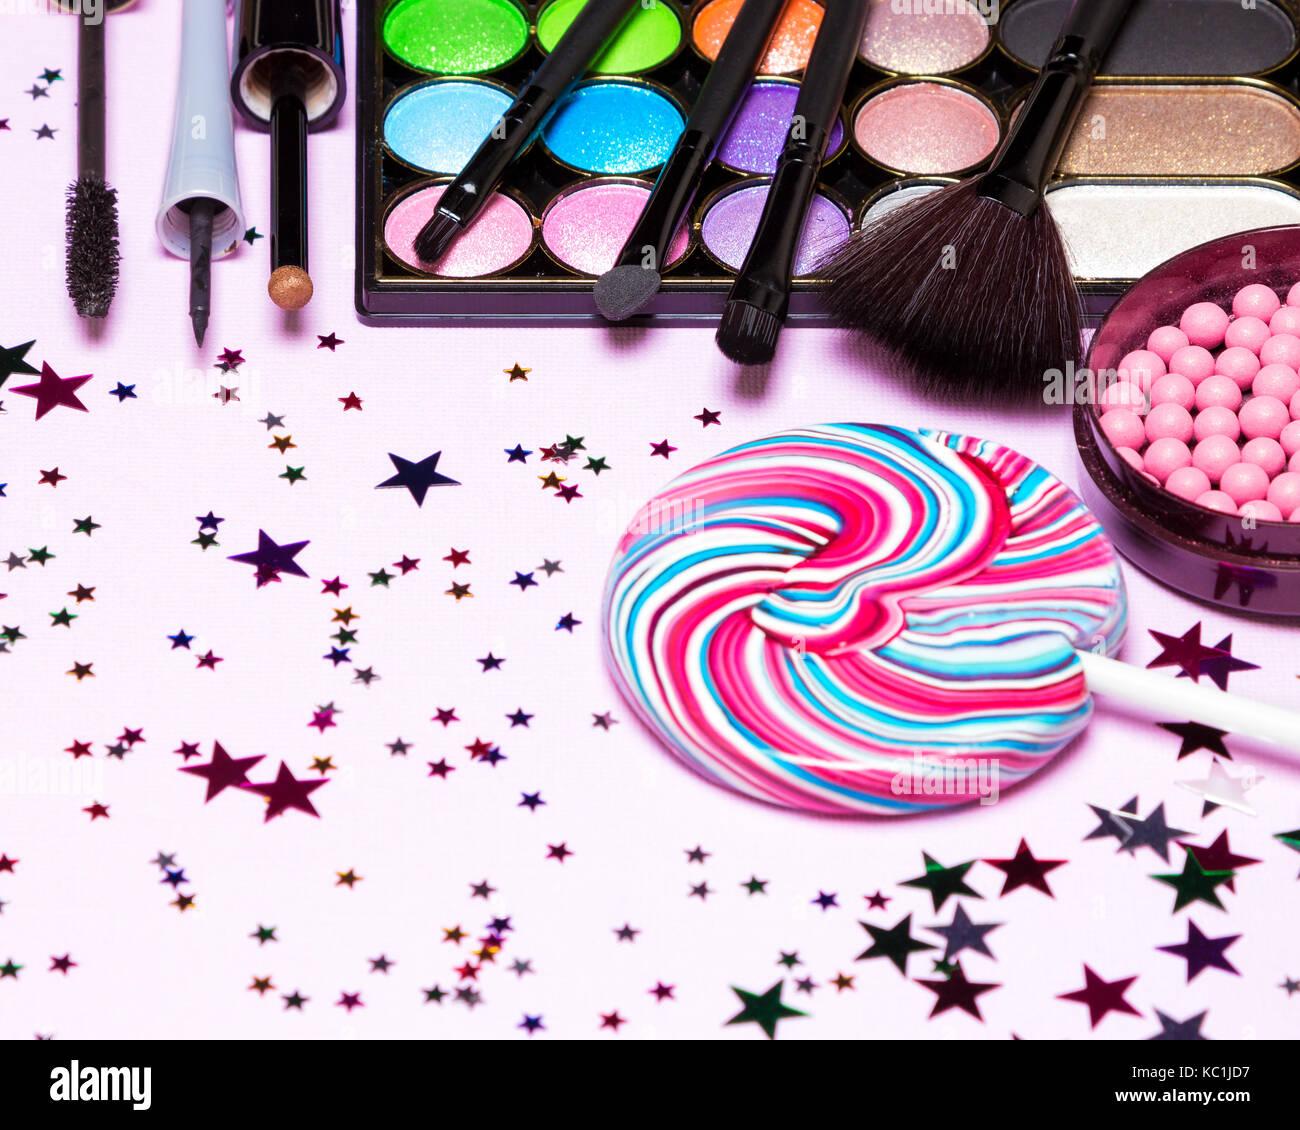 Holiday Party Make-up Kosmetik. Farbe glitzer Lidschatten, Rouge, flüssigen Eyeliner, Mascara, Bürsten Stockbild